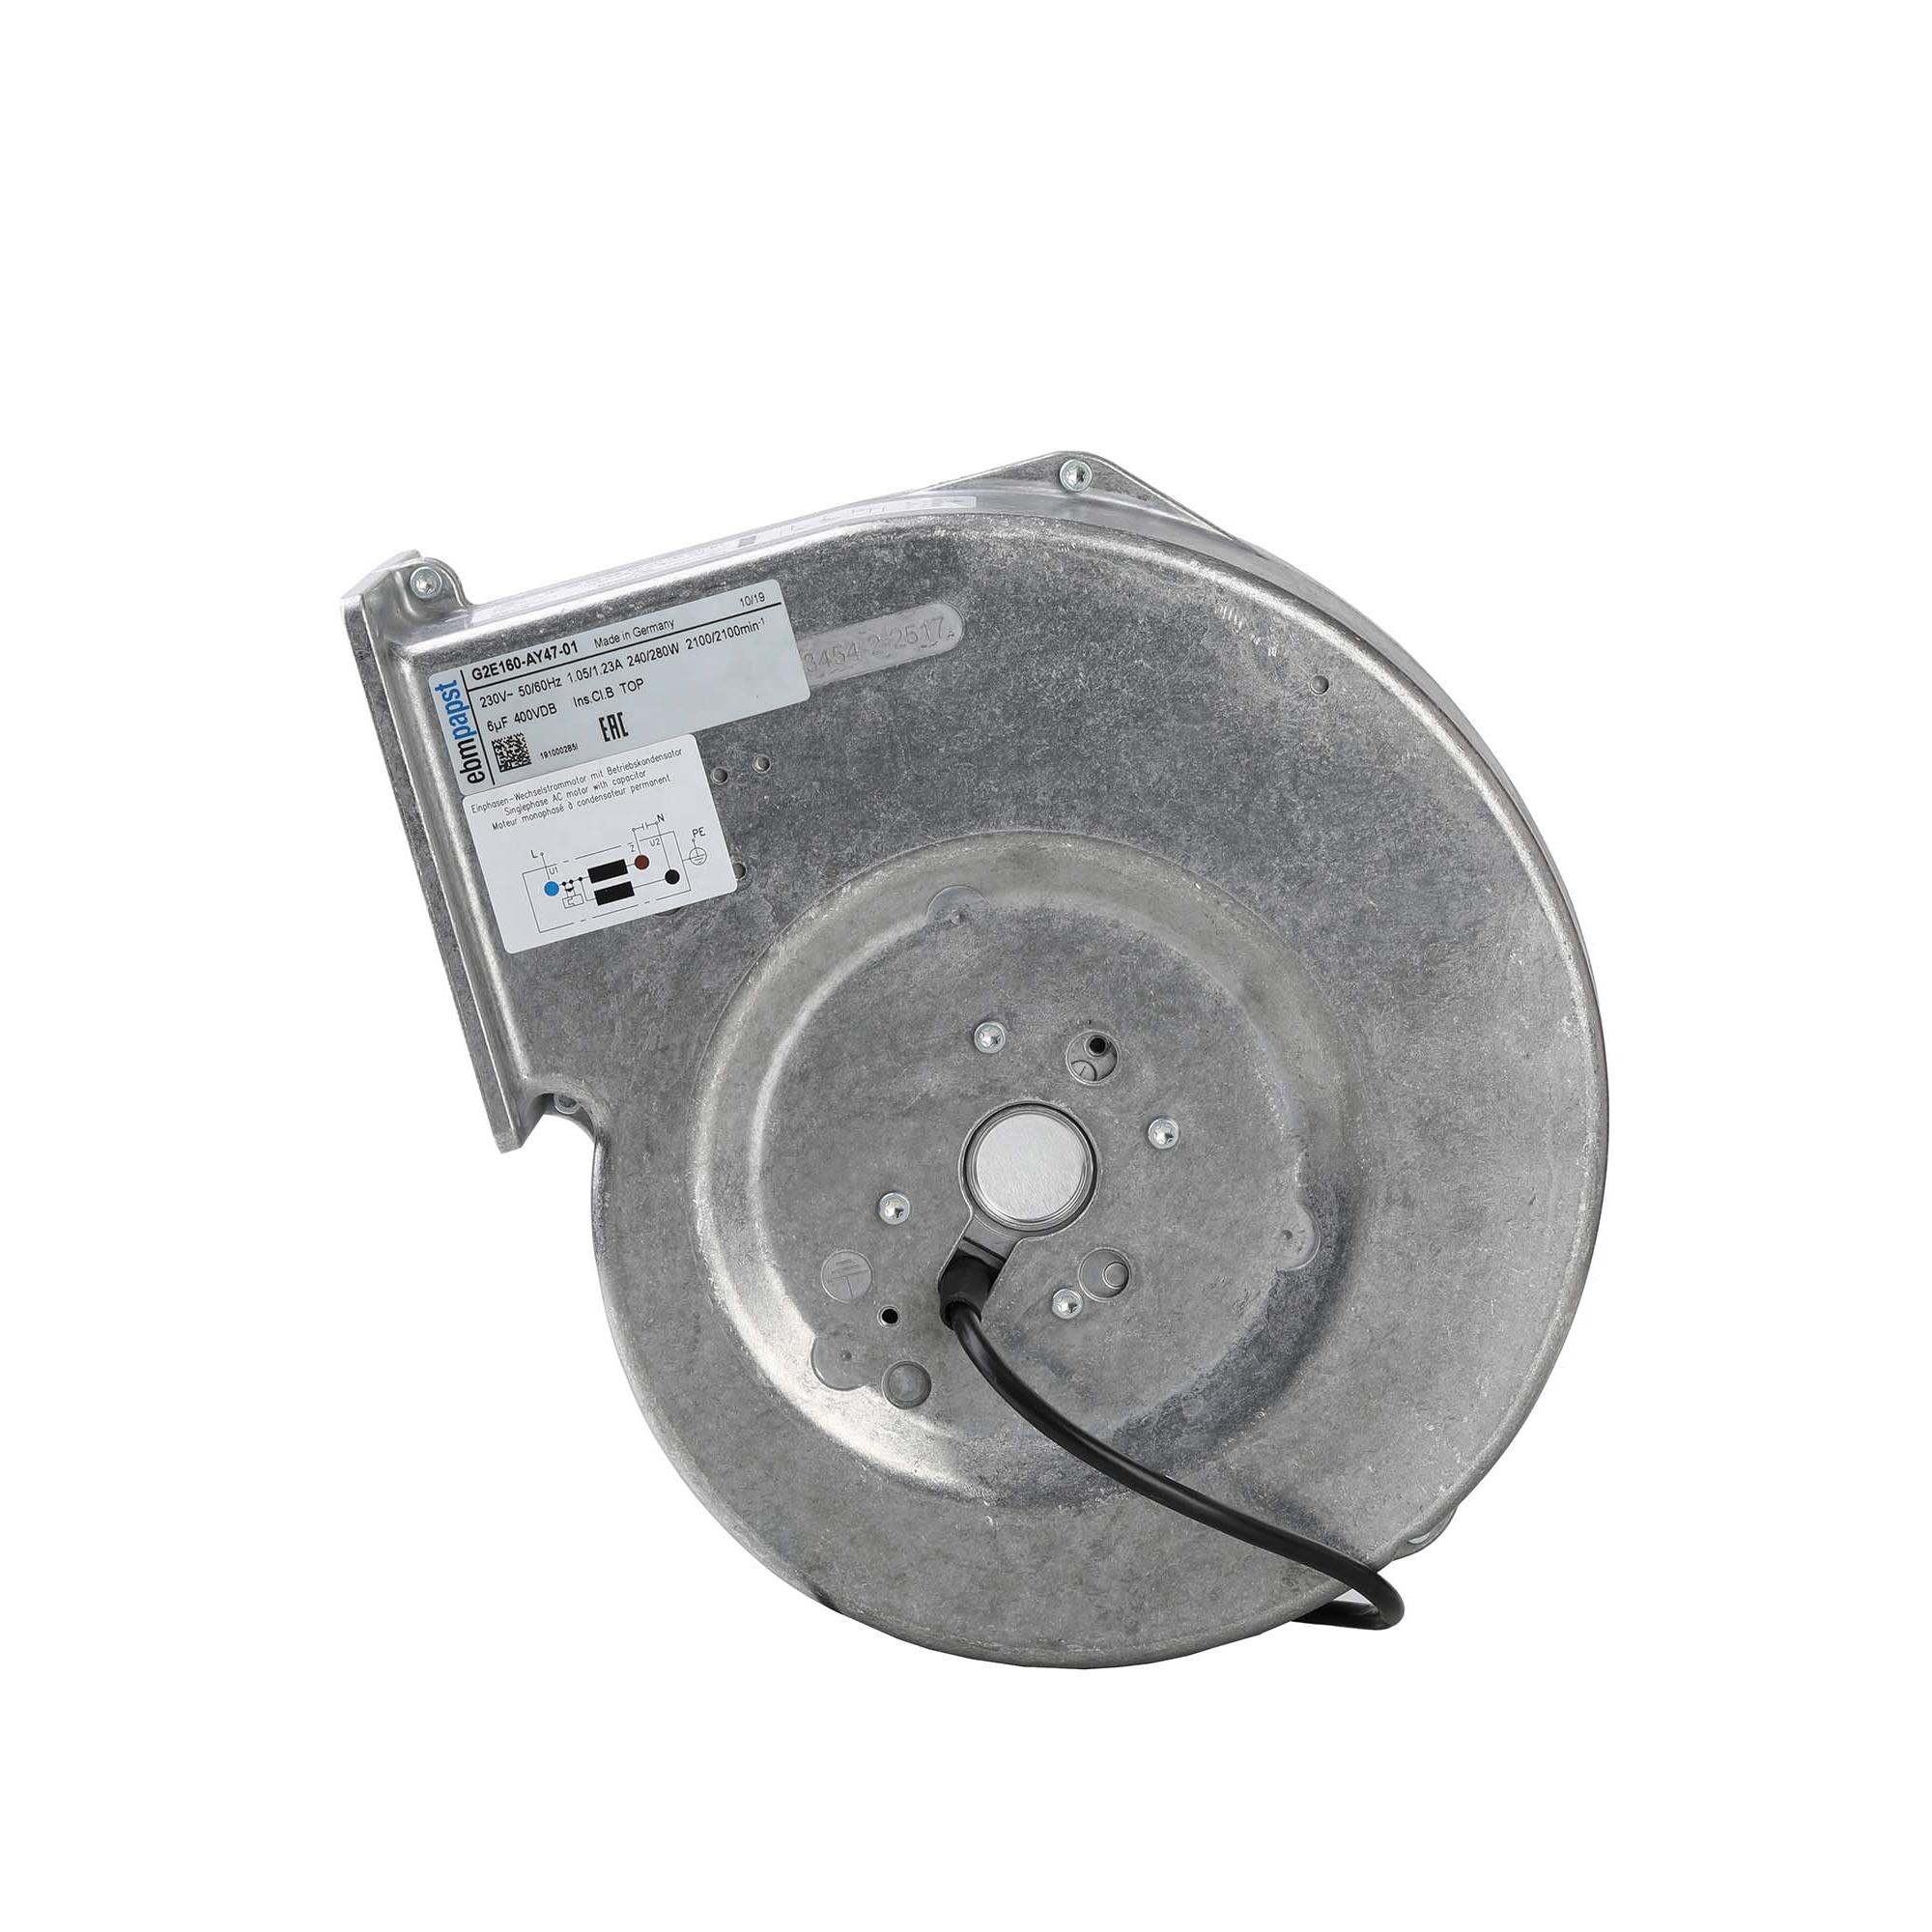 EBM PAPST G2E160-AY47-01 Ventilador